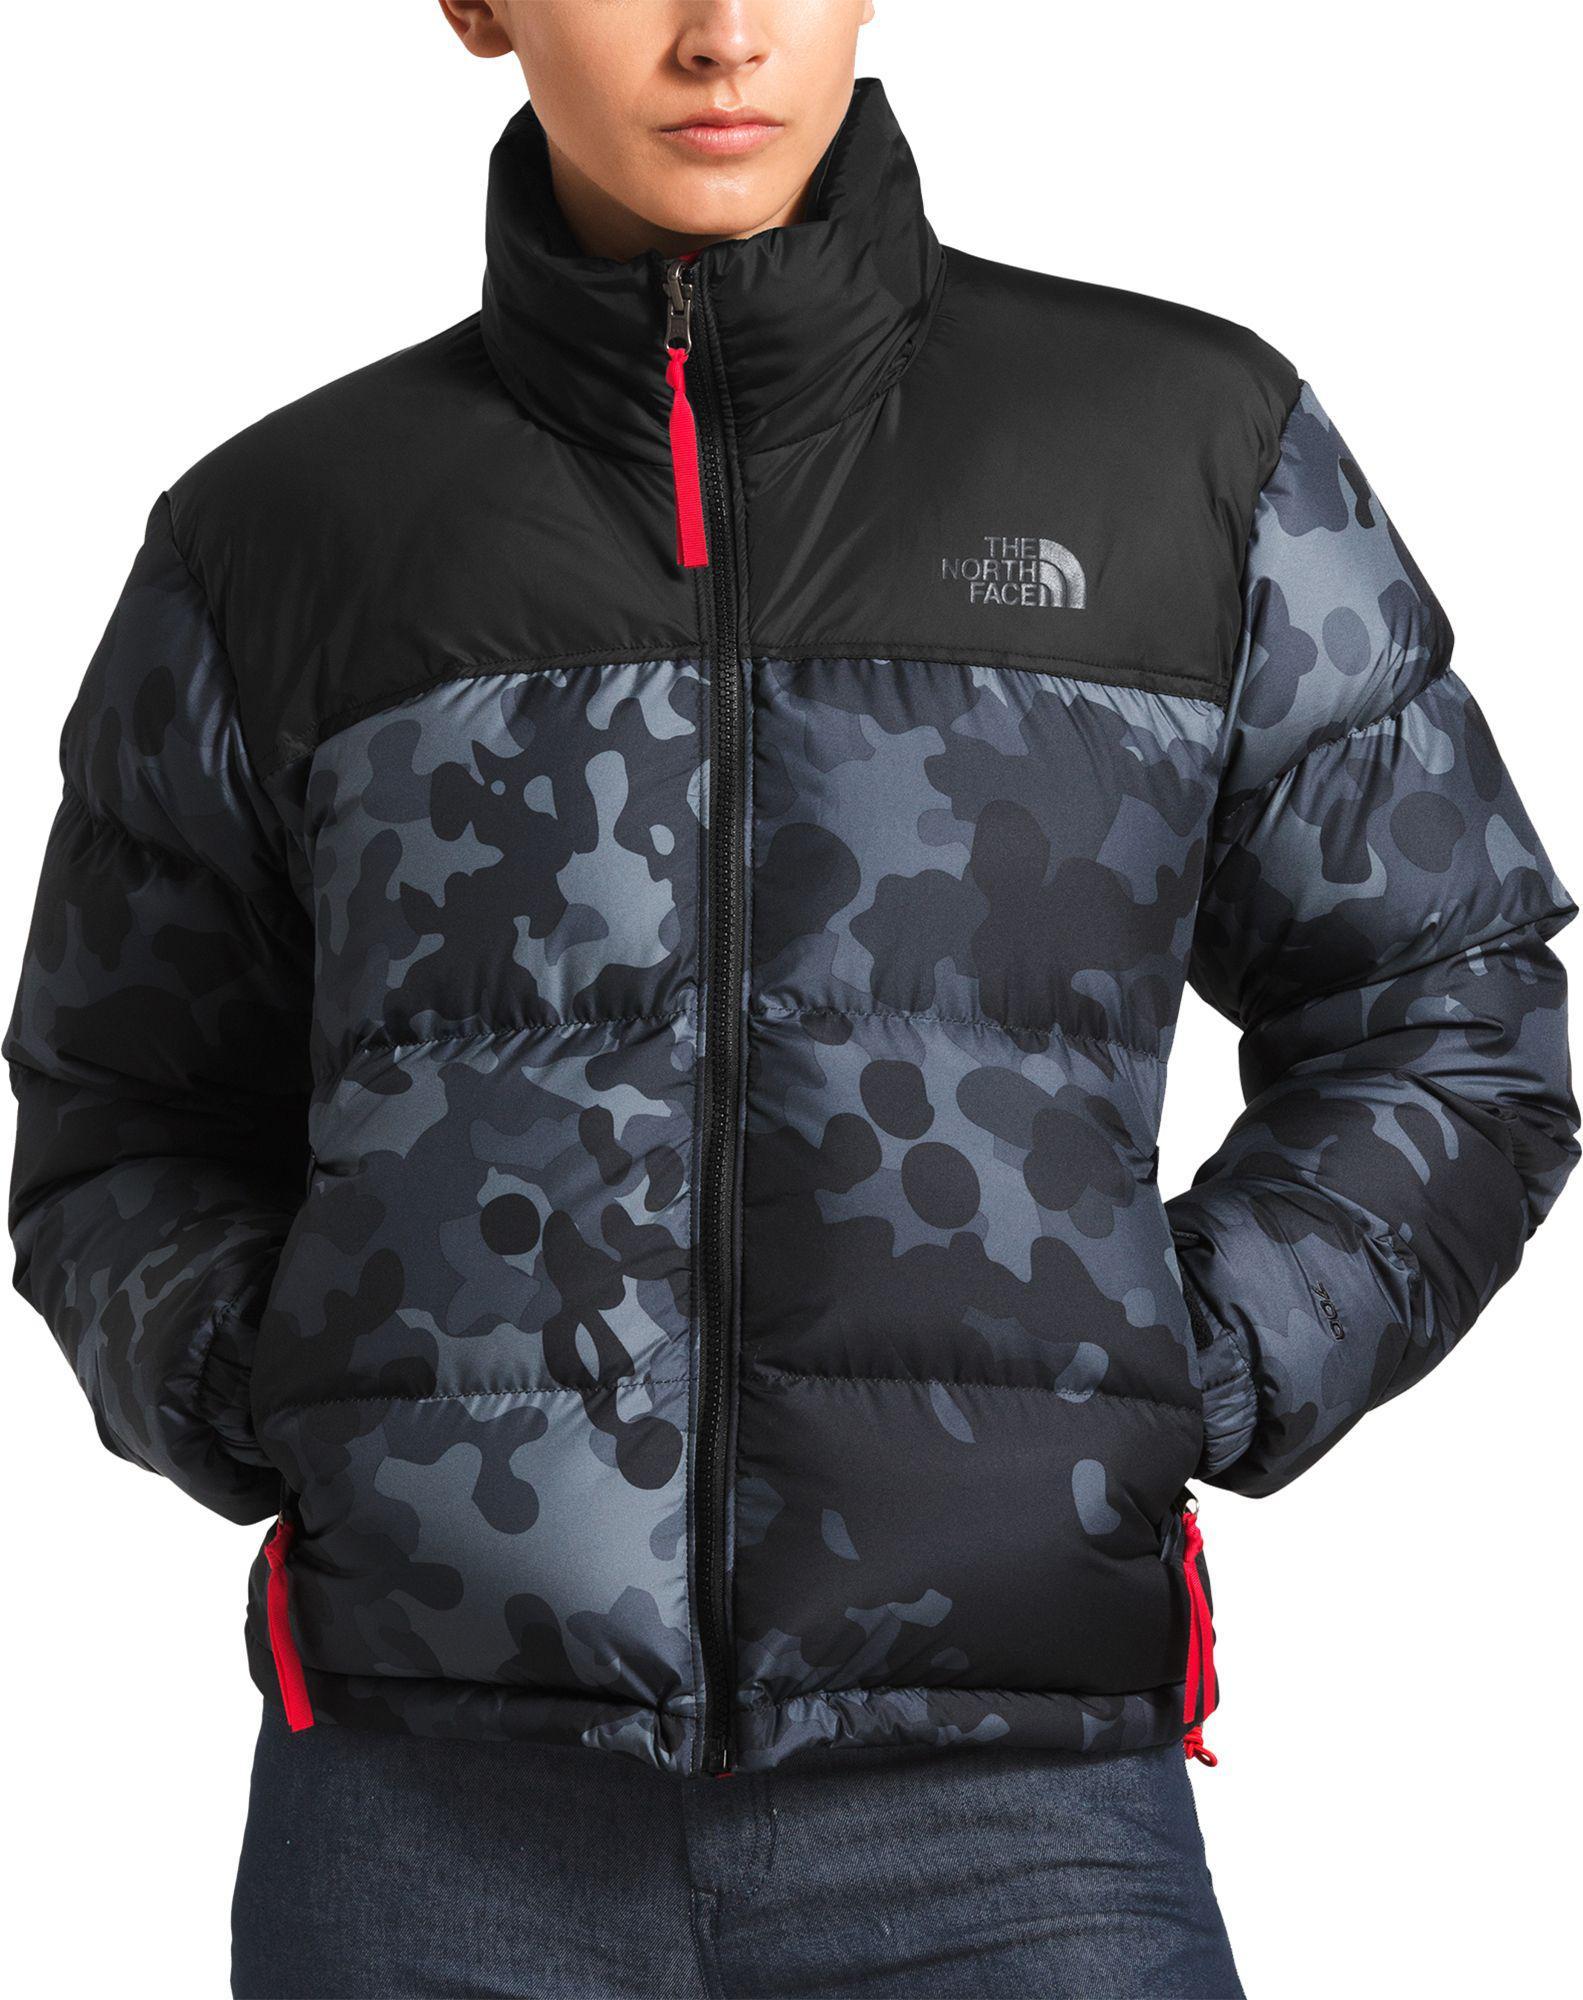 Lyst - The North Face 1996 Retro Seasonal Nuptse Jacket in Black bf061dab3